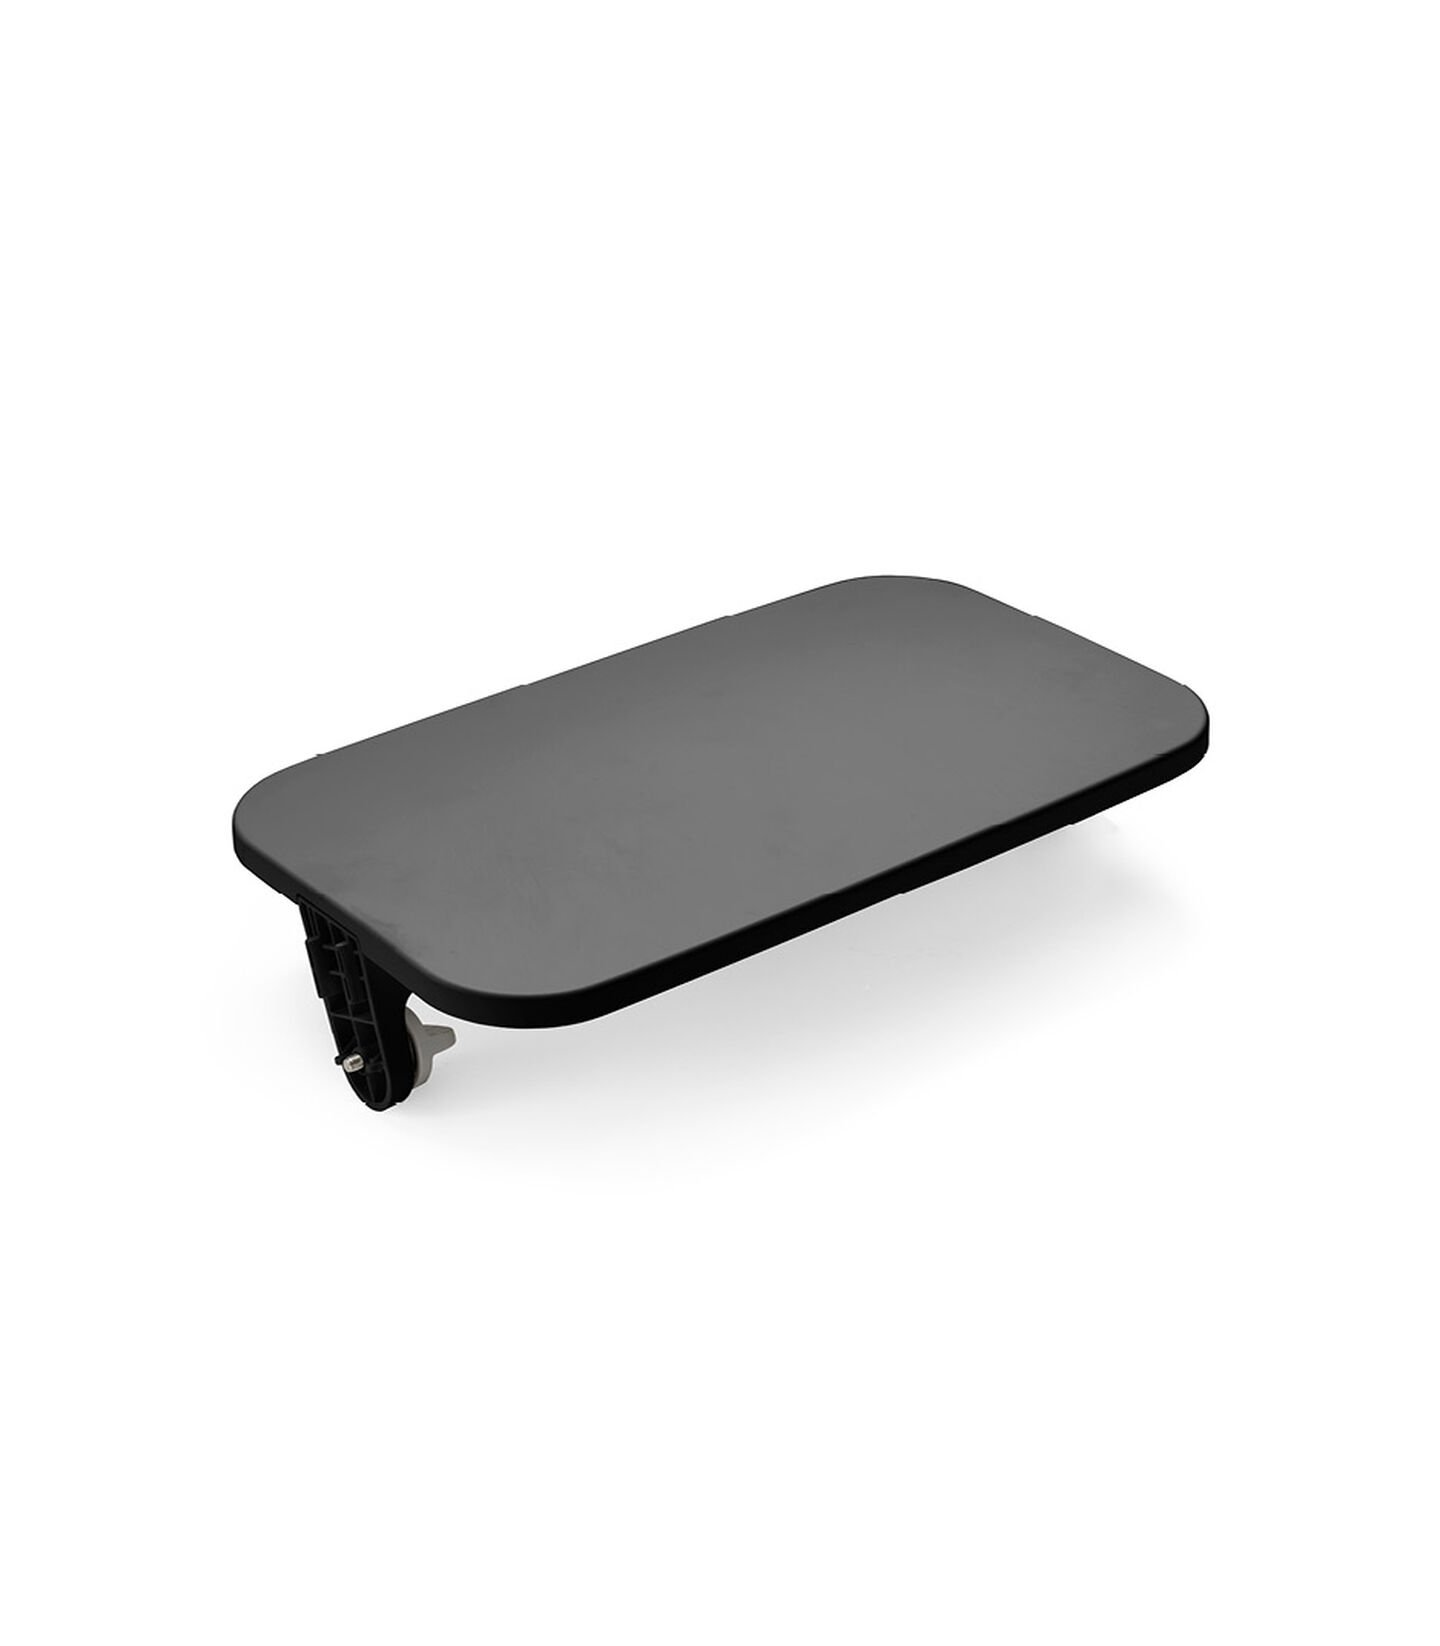 Stokke® Steps™ Chair Footrest Black, Noir, mainview view 1